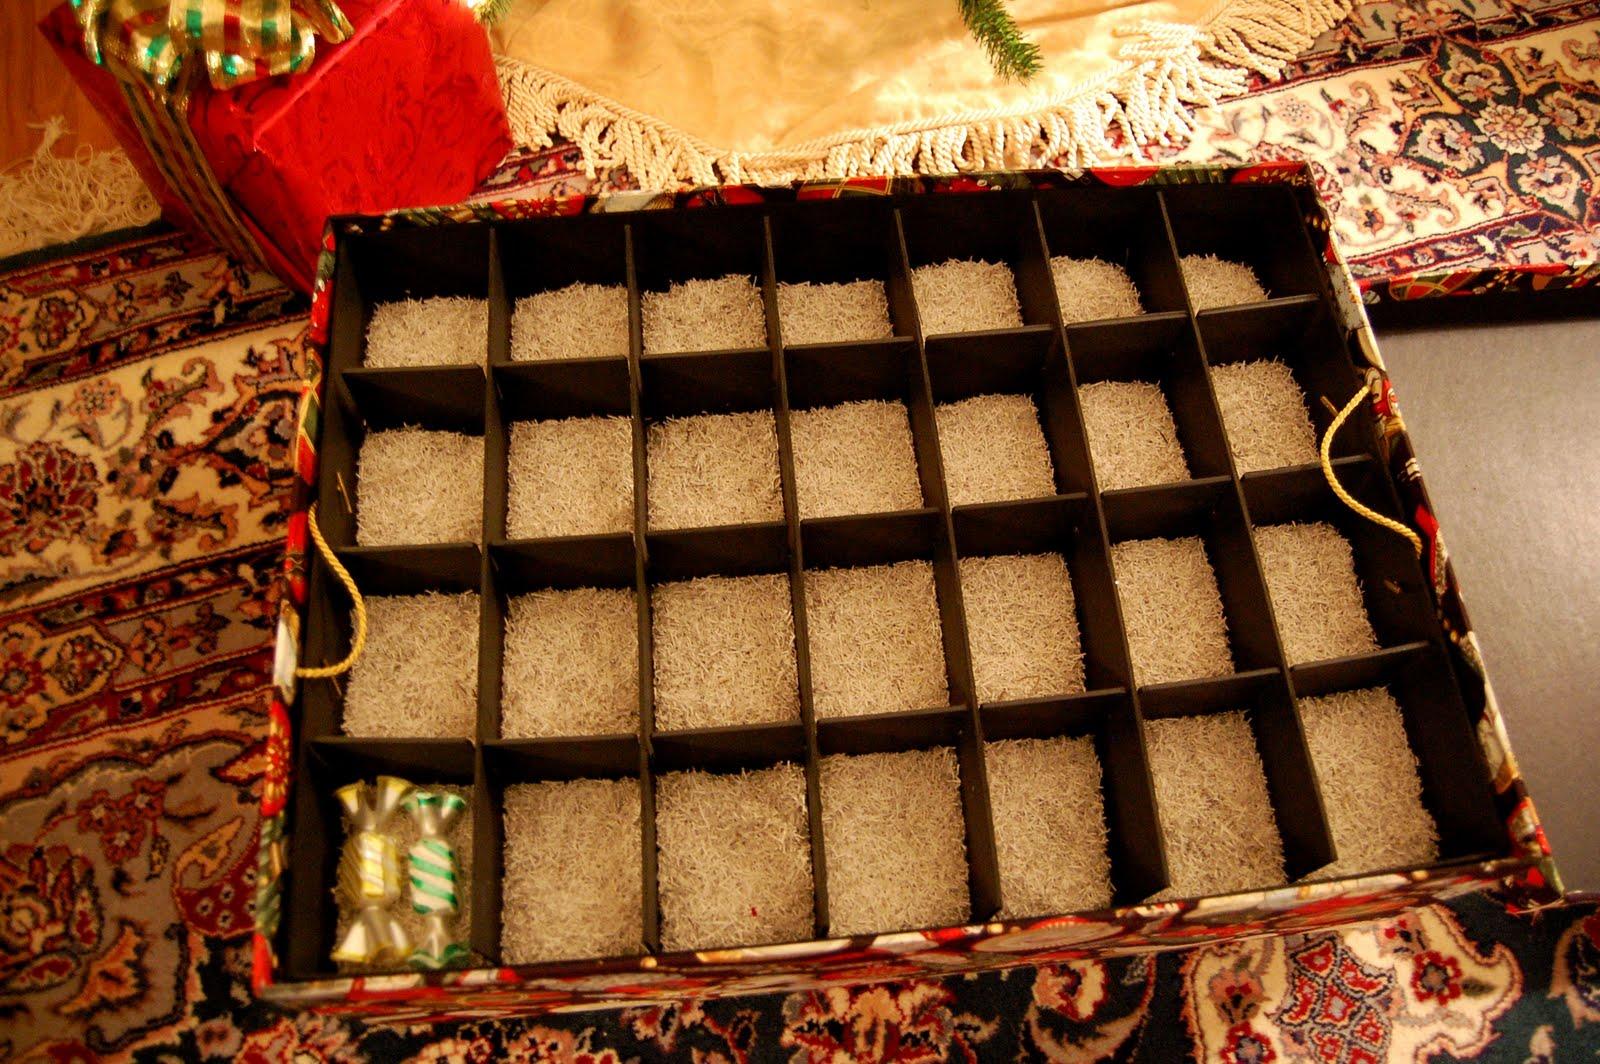 Storage For Christmas Decorations Christmas Decor Storage Christmas Decor Storage Iheart Organizing